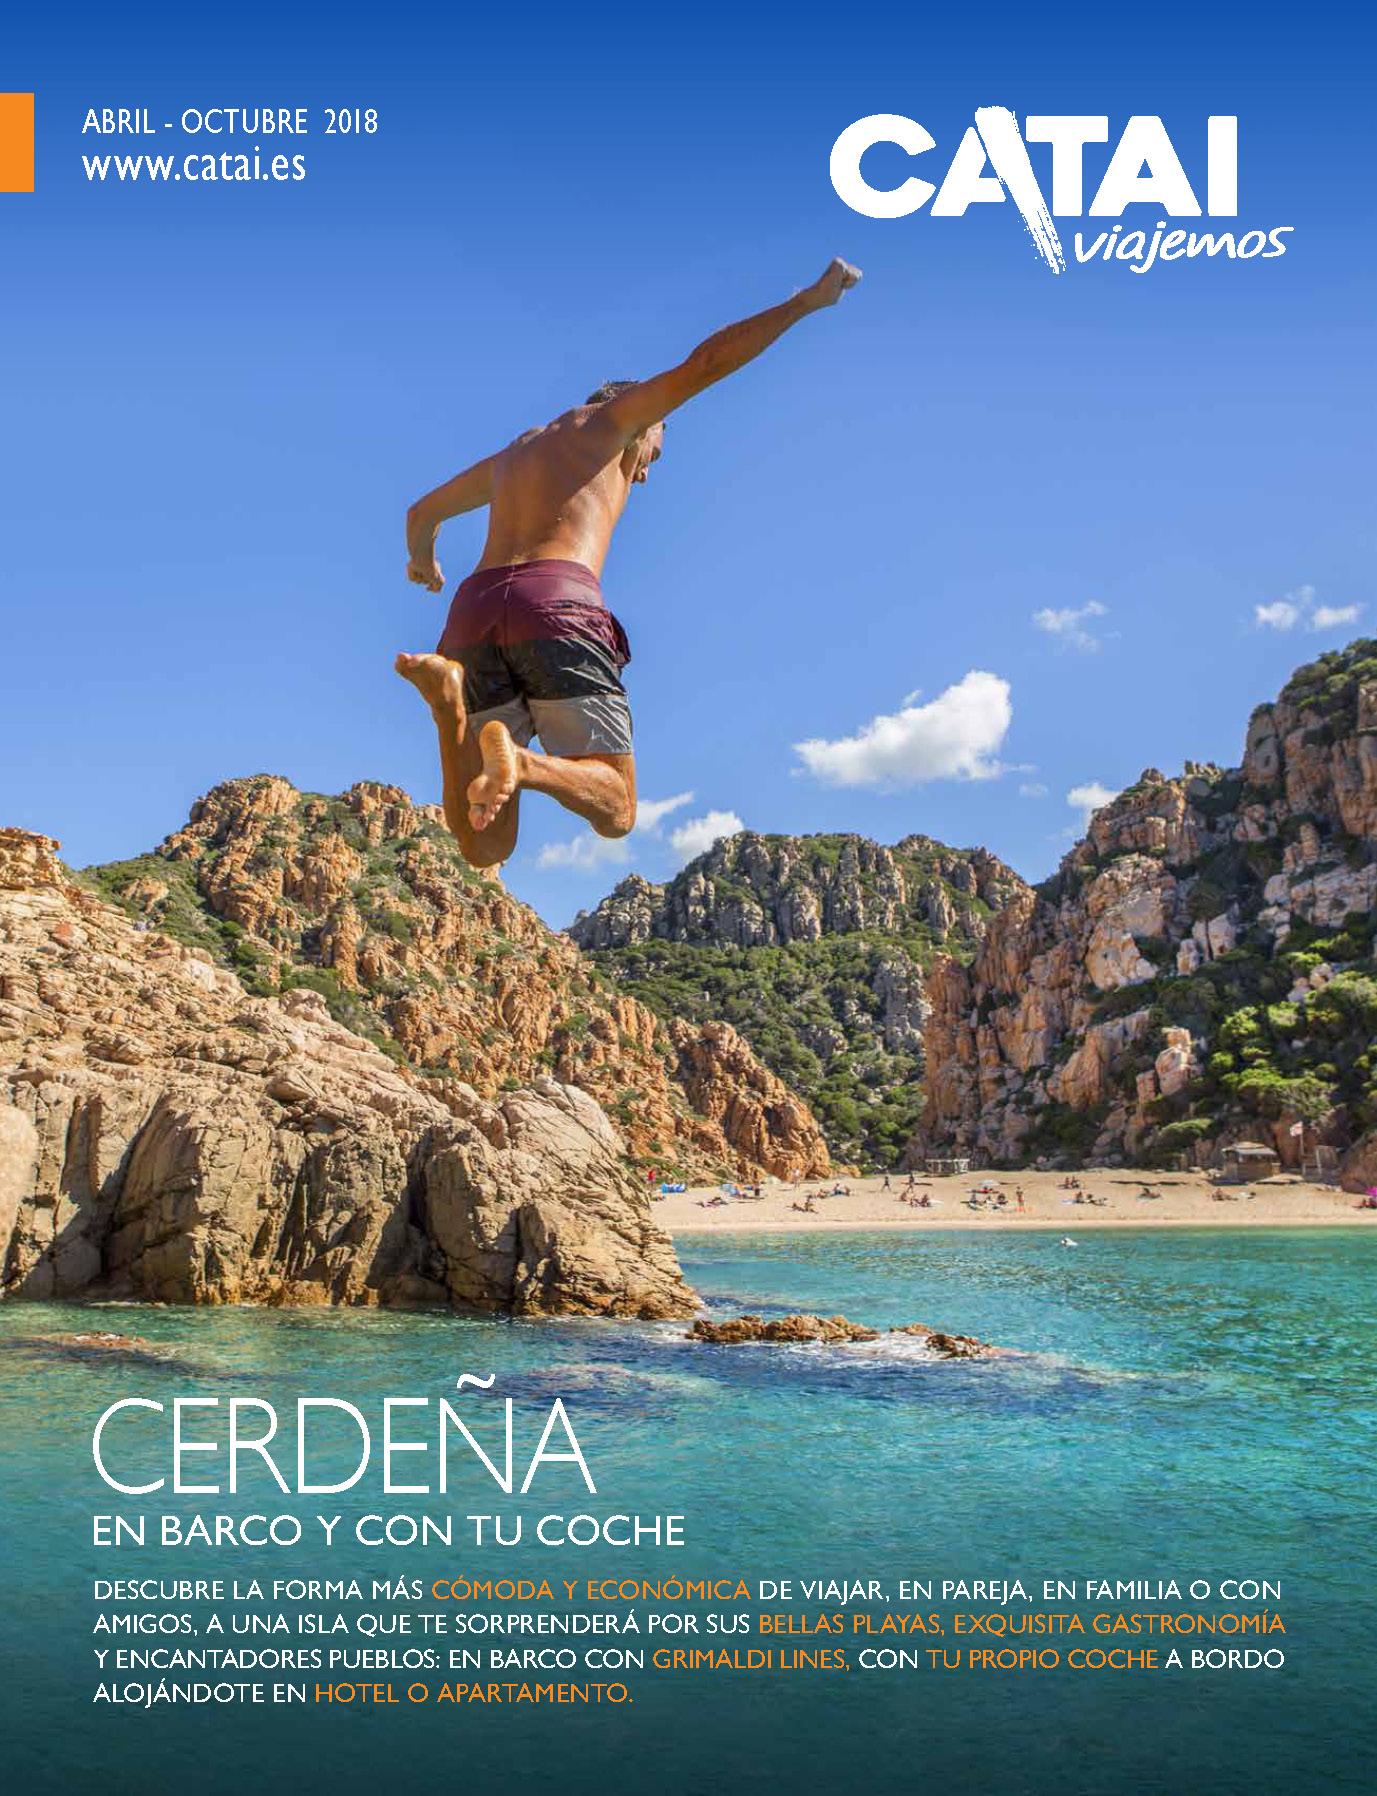 Catalogo Catai Tours Cerdena 2018